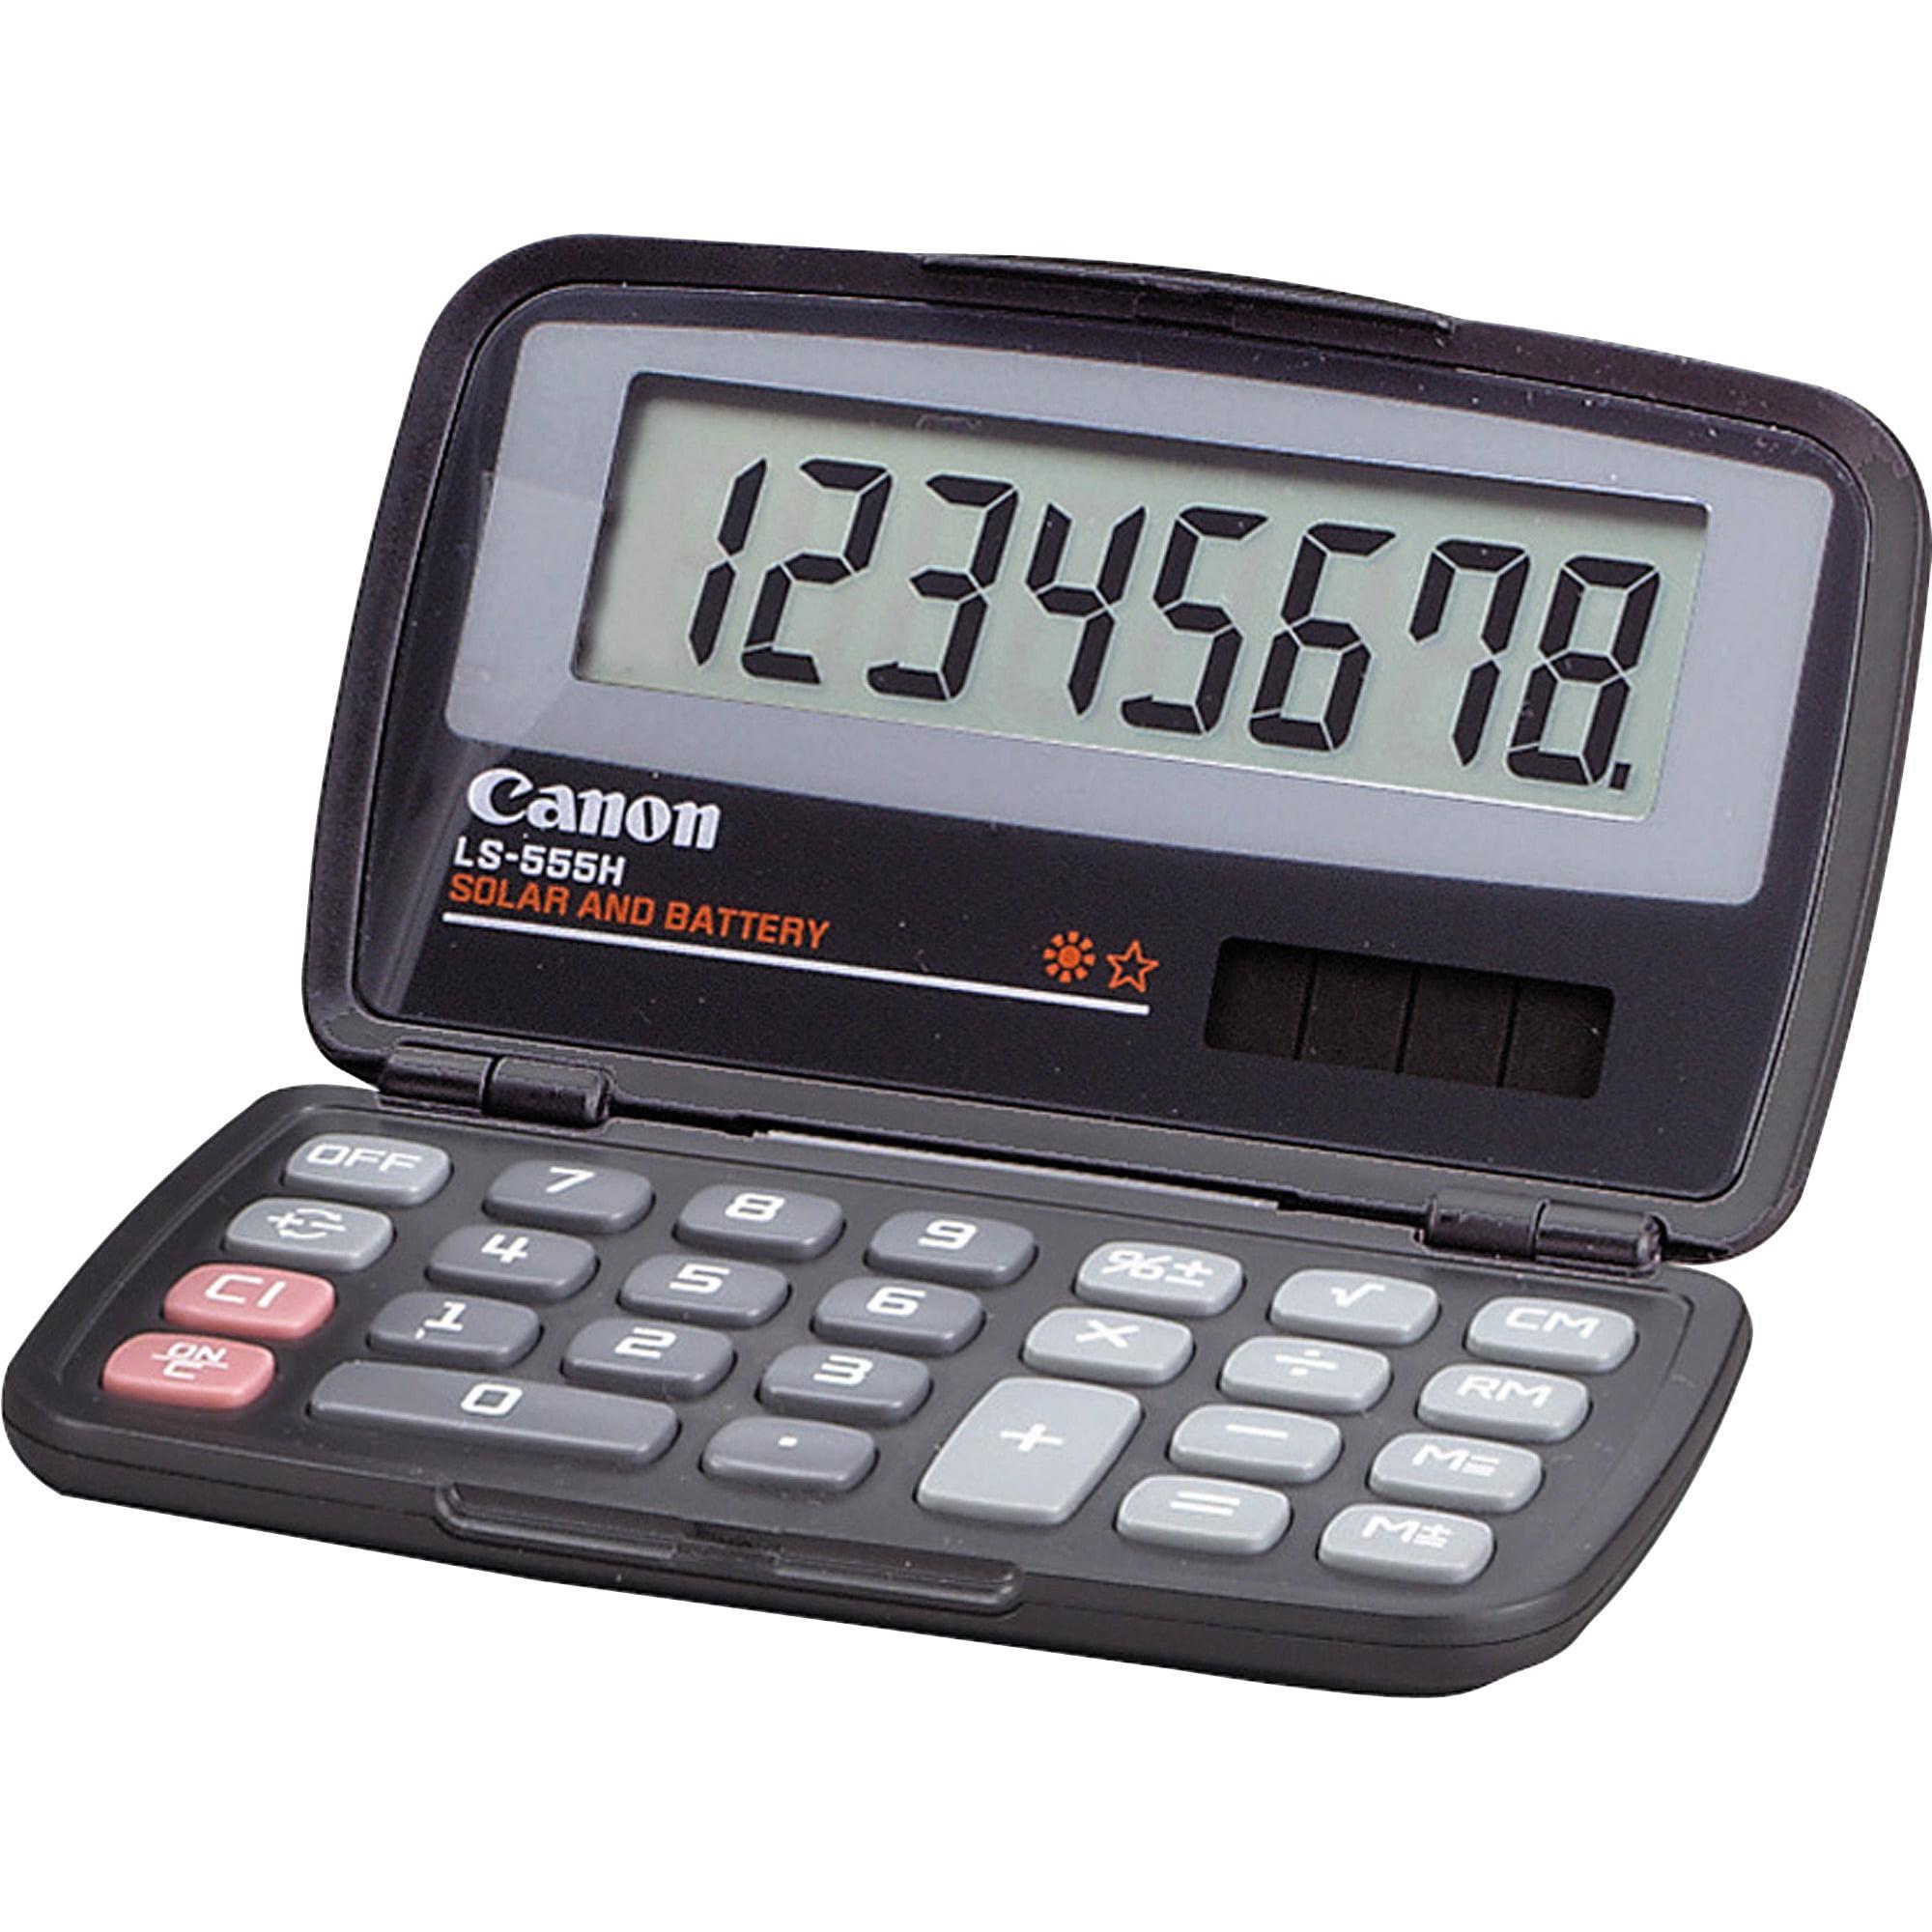 Canon LS555H Wallet Calculator, Black, 1 Each (Quantity)